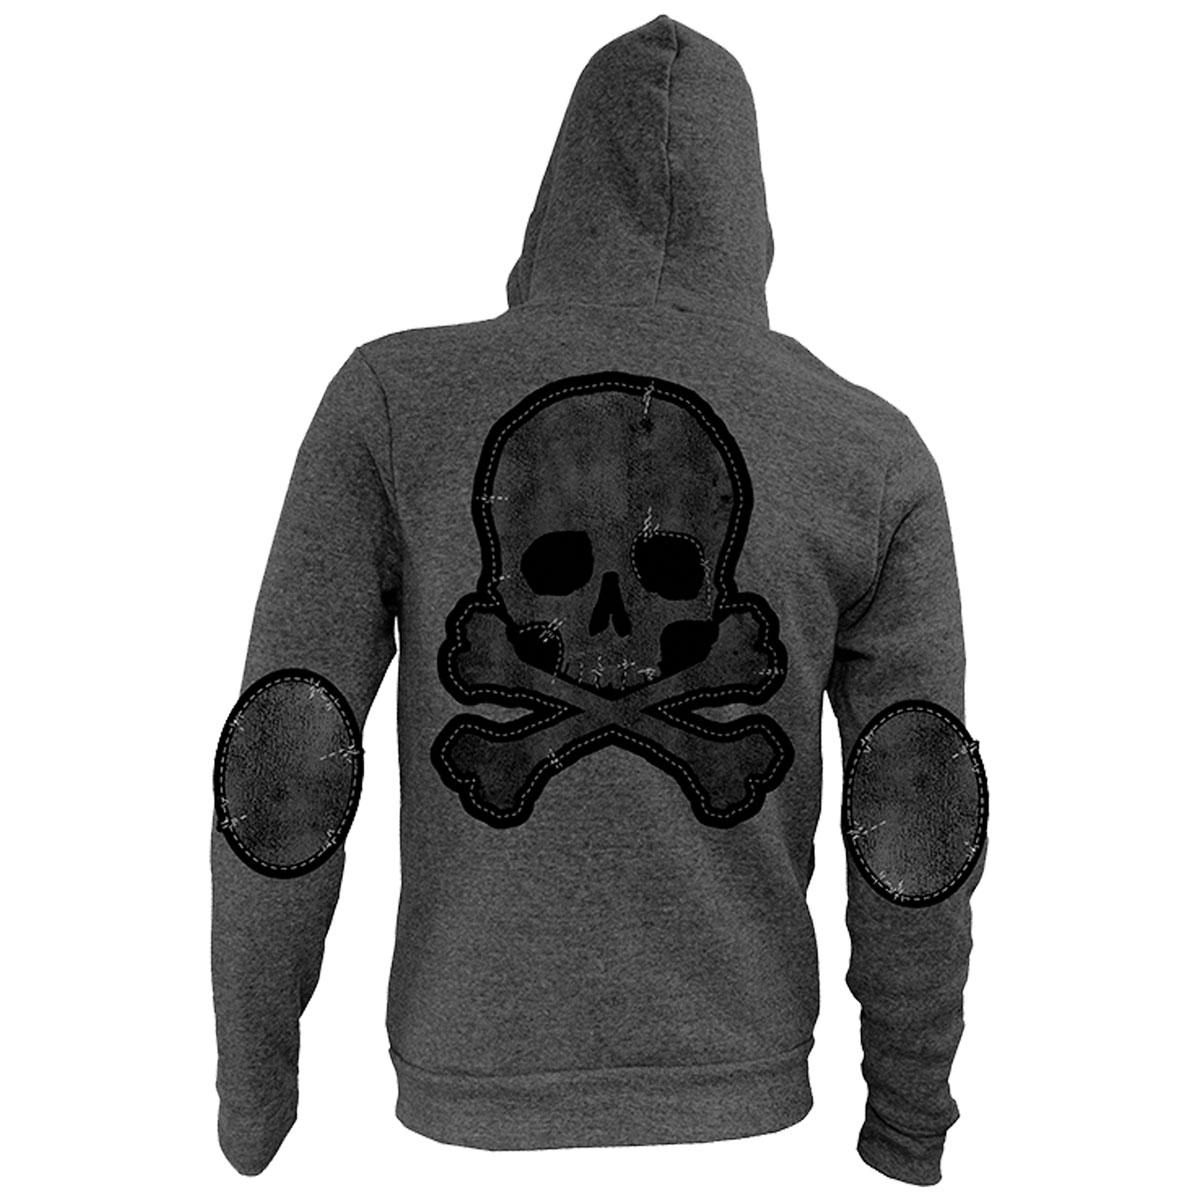 Lethal Angel Women's Grunge Skull Patch Gray Full Zip Hoodie